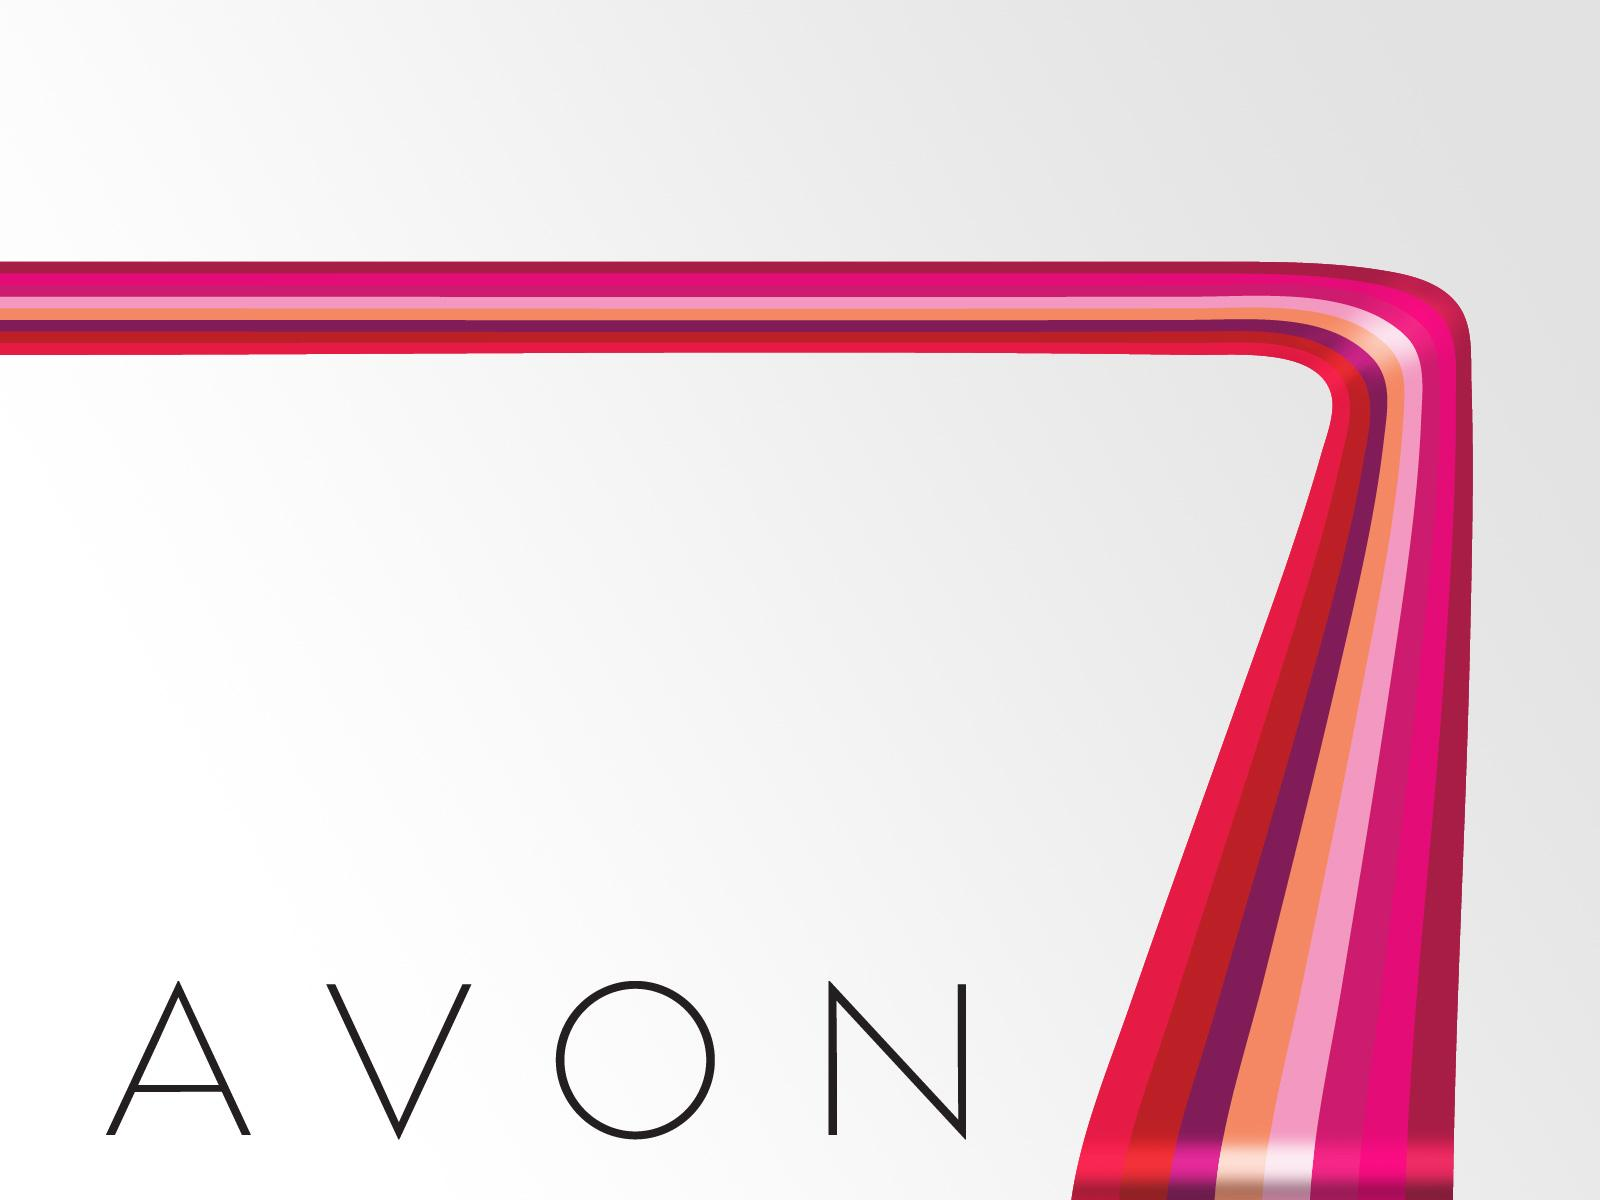 Avon Wallpapers - Wallpaper Cave